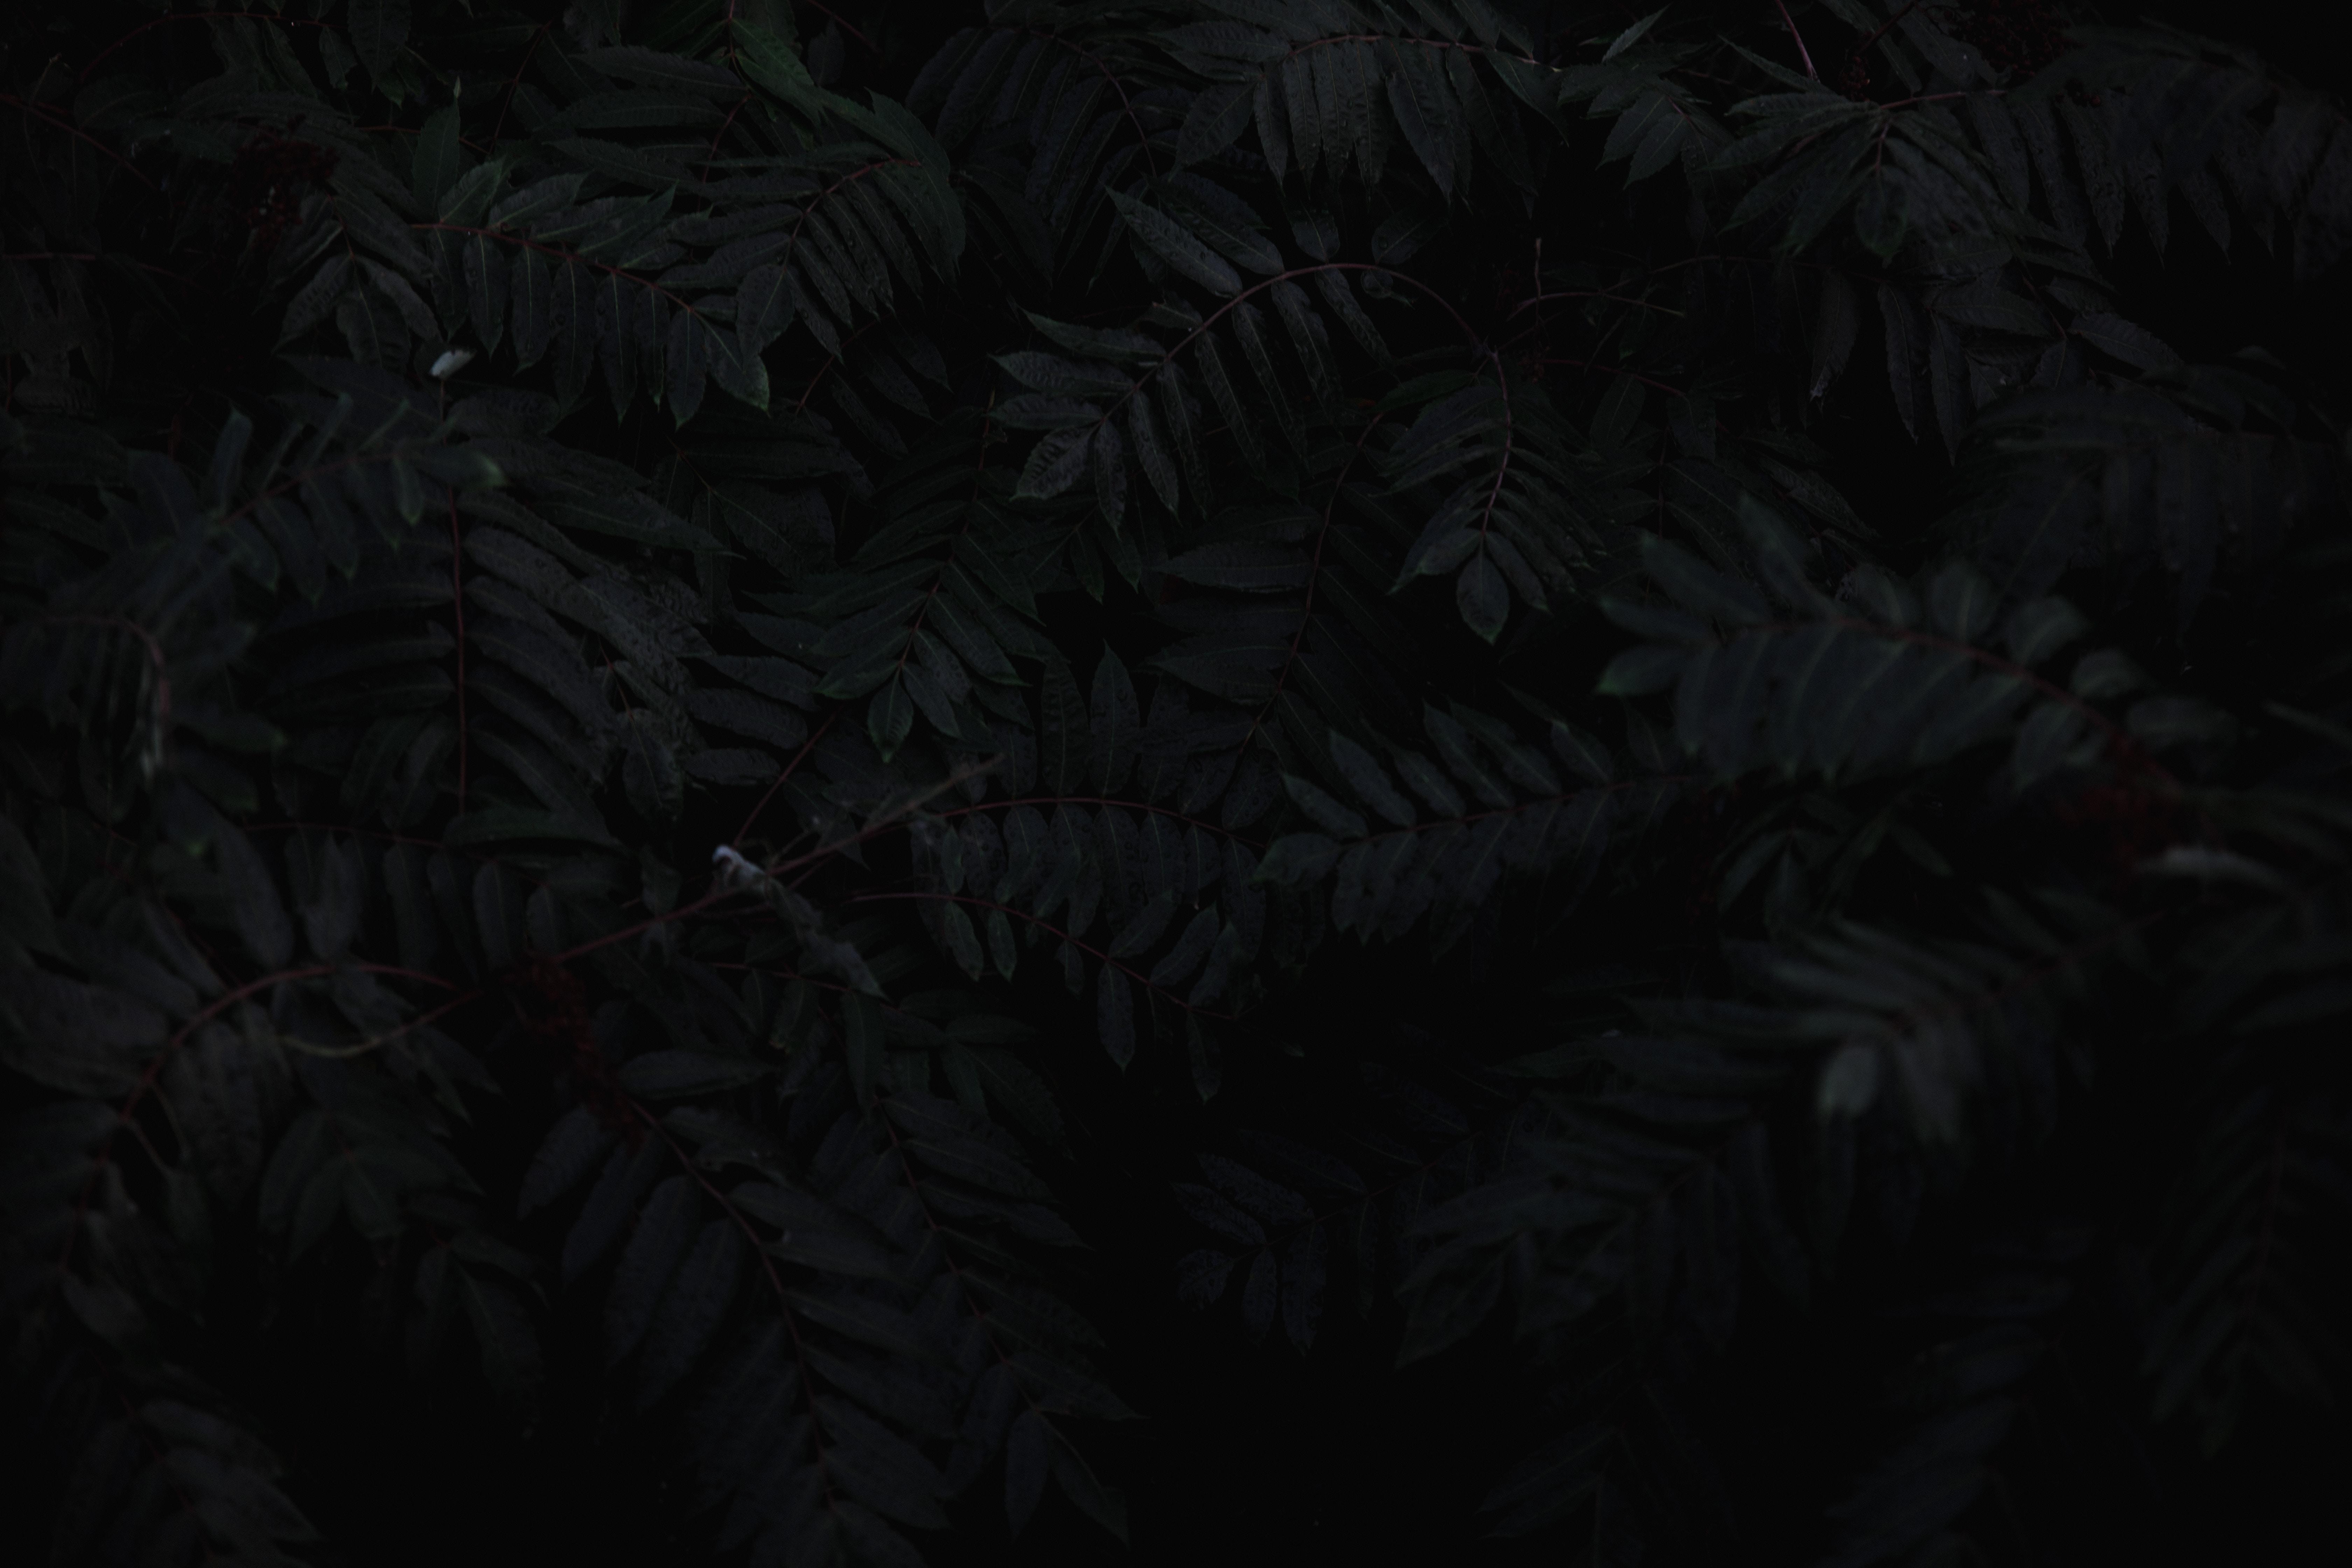 gray leaves